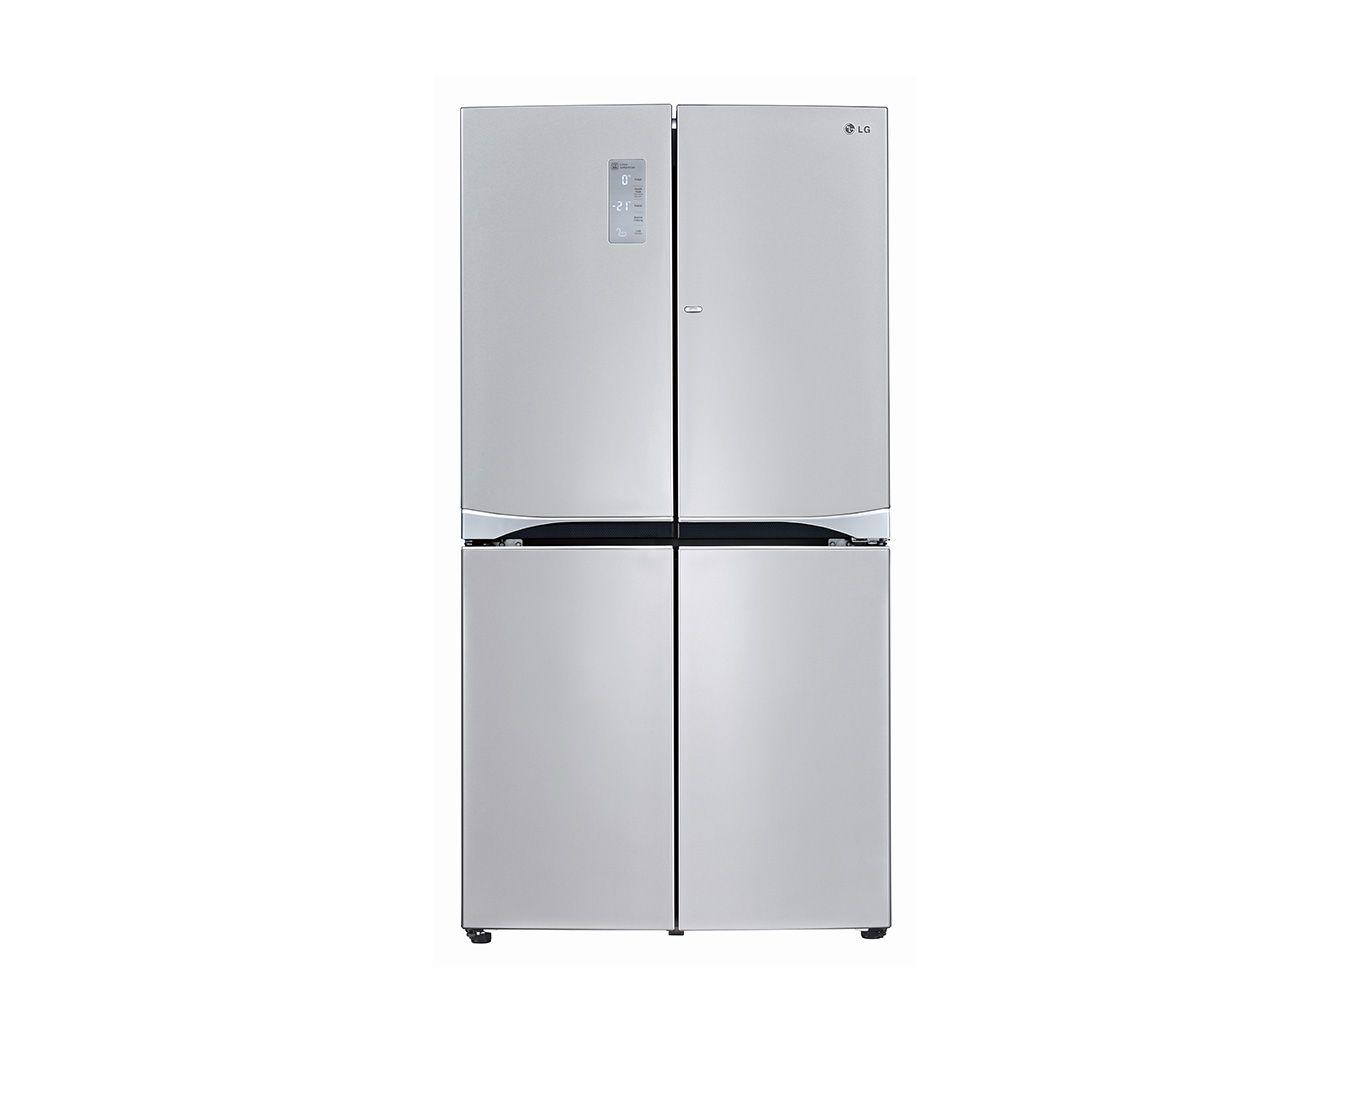 Kühlschrank Lg : Kühlschrank kaufen lg kühlschrank kaufen leise